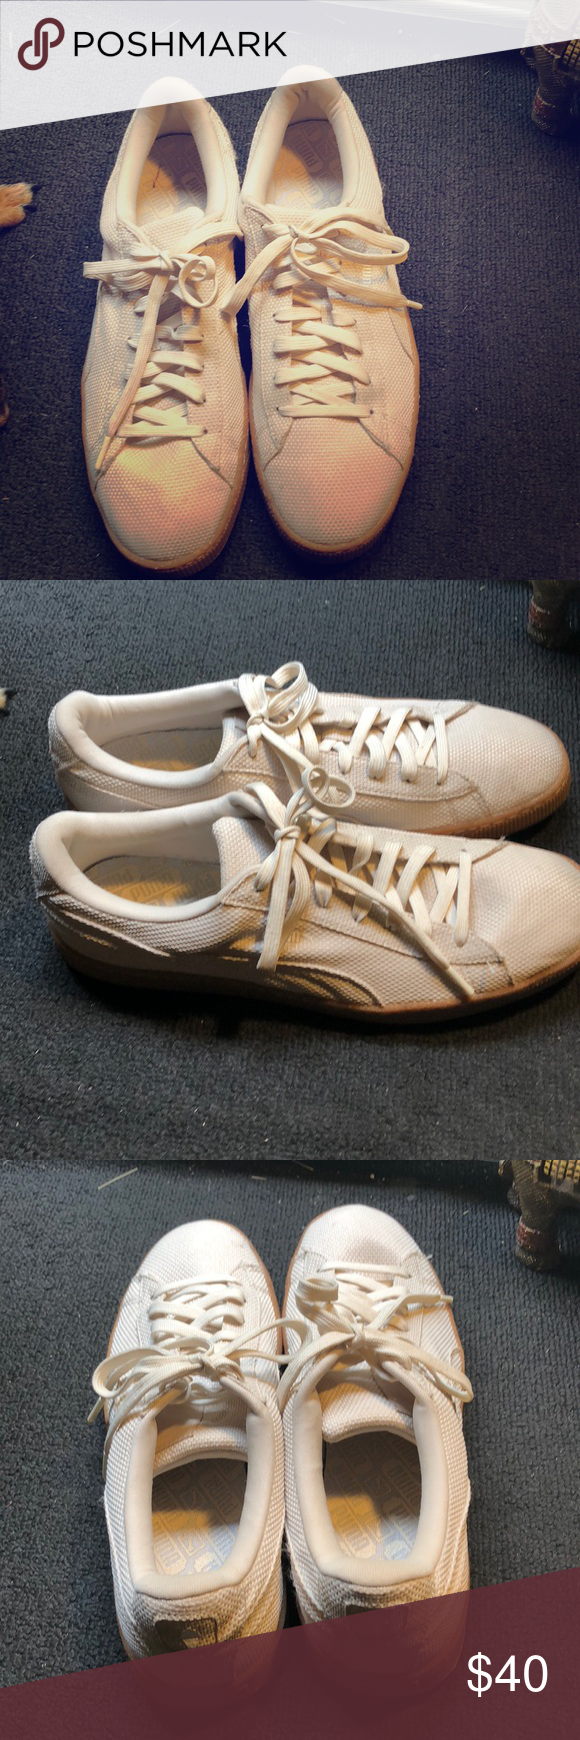 a2837b0e90f Puma Basket mens Mens Puma Basket Ripstop Ice Cream pack White swan Puma  Shoes Sneakers